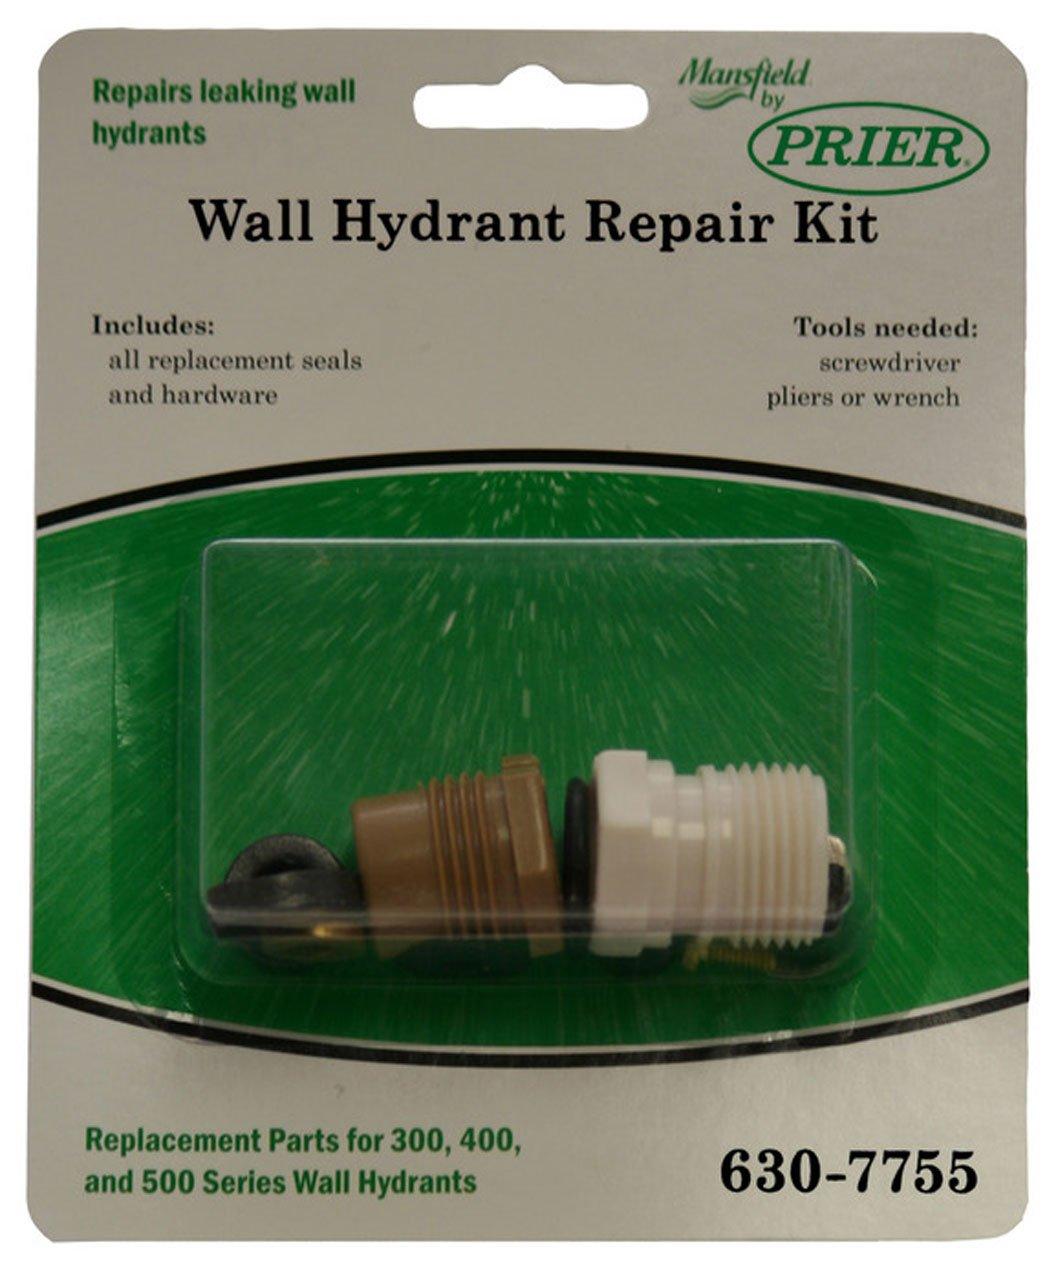 Prier 630-7755 Wall Hydrant Repair Kit - Lawn & Garden Watering ...